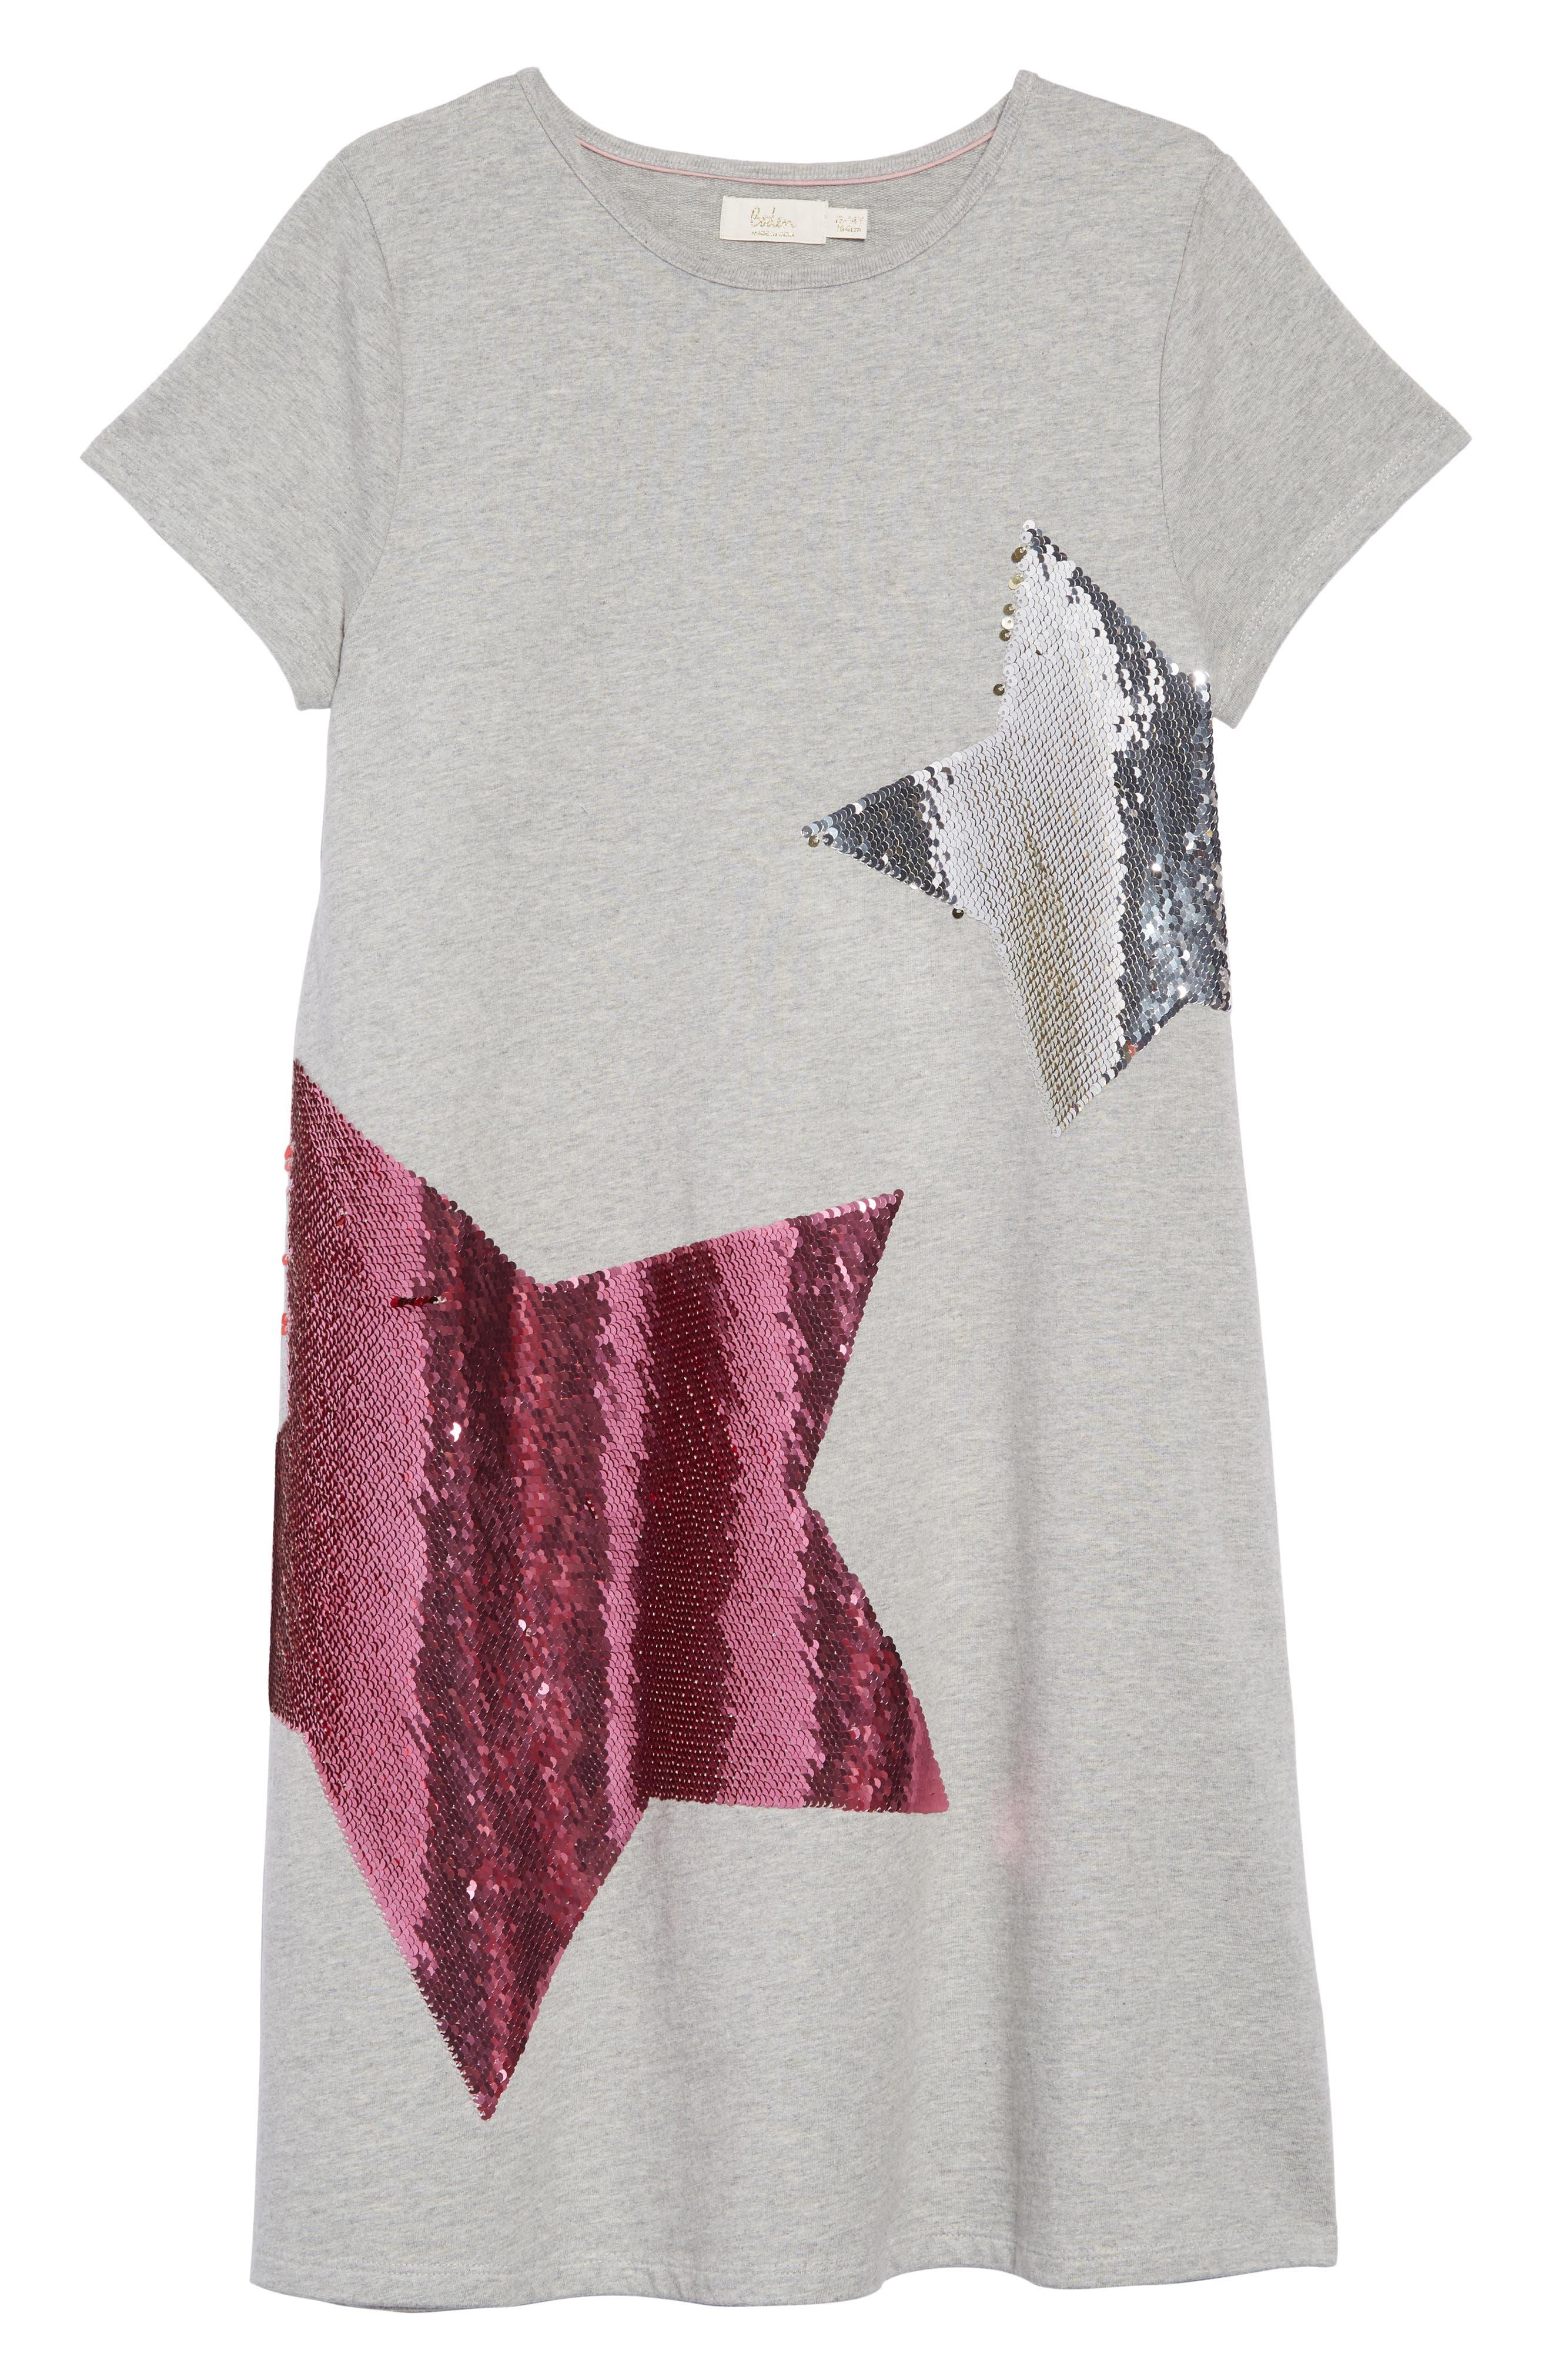 Shimmer Flip Sequin Star T-Shirt Dress, Main, color, GRY GREY MARL/ RAINBOW SEQUINS